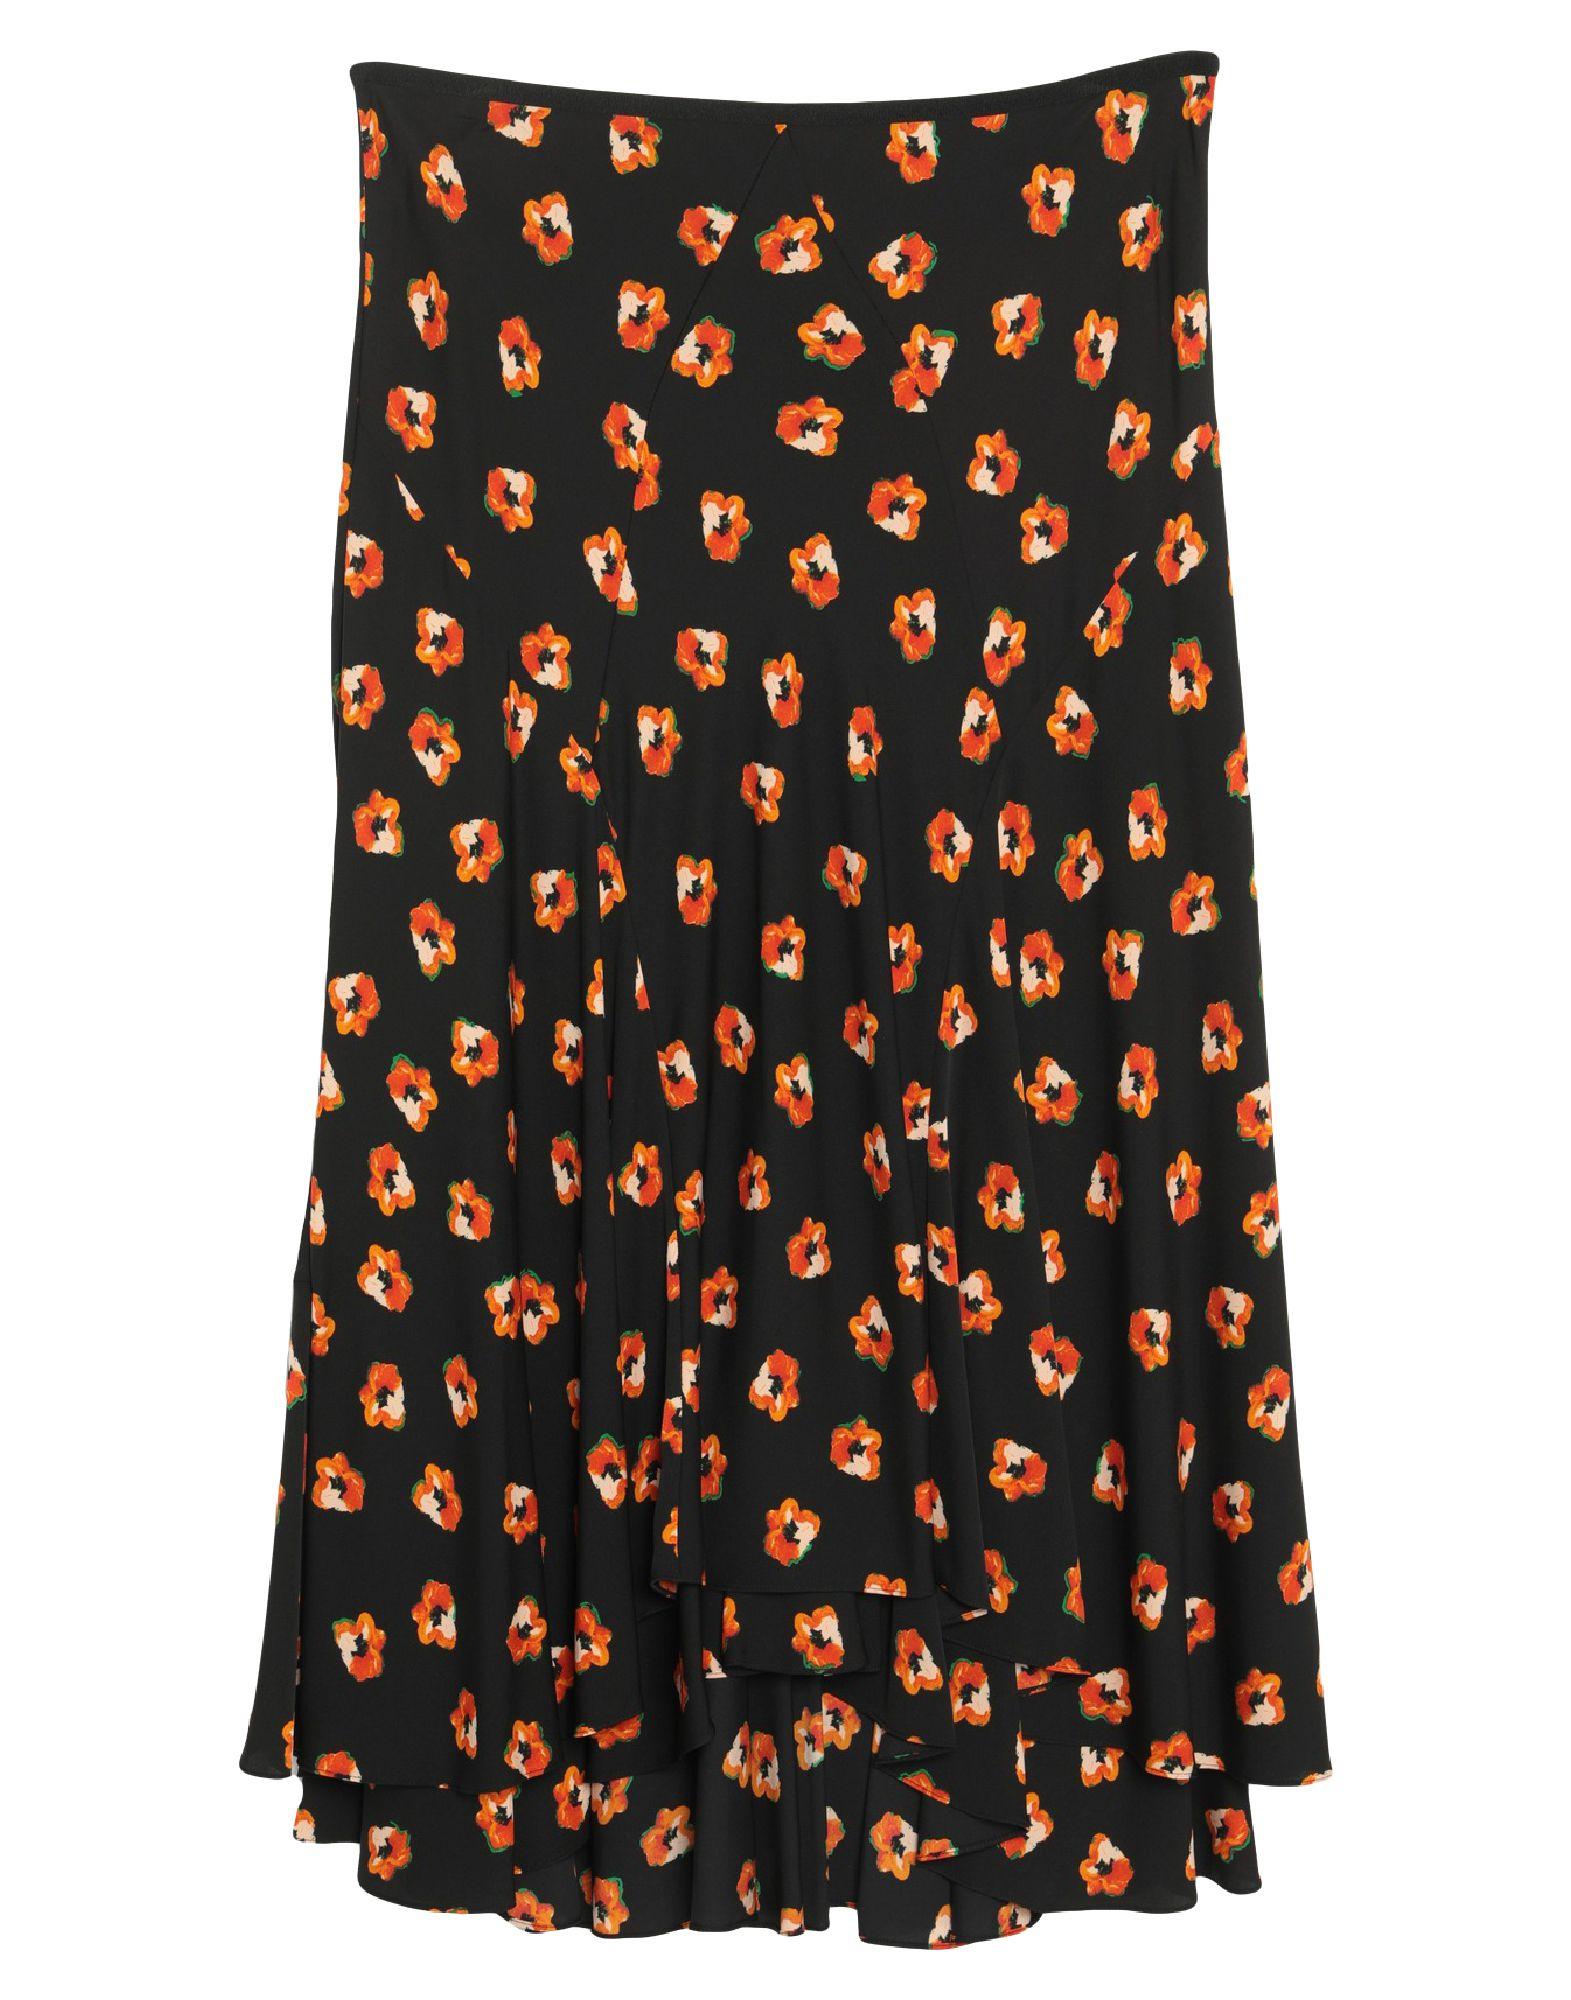 DIANE VON FURSTENBERG Юбка длиной 3/4 юбка diane von furstenberg юбки макси длинные